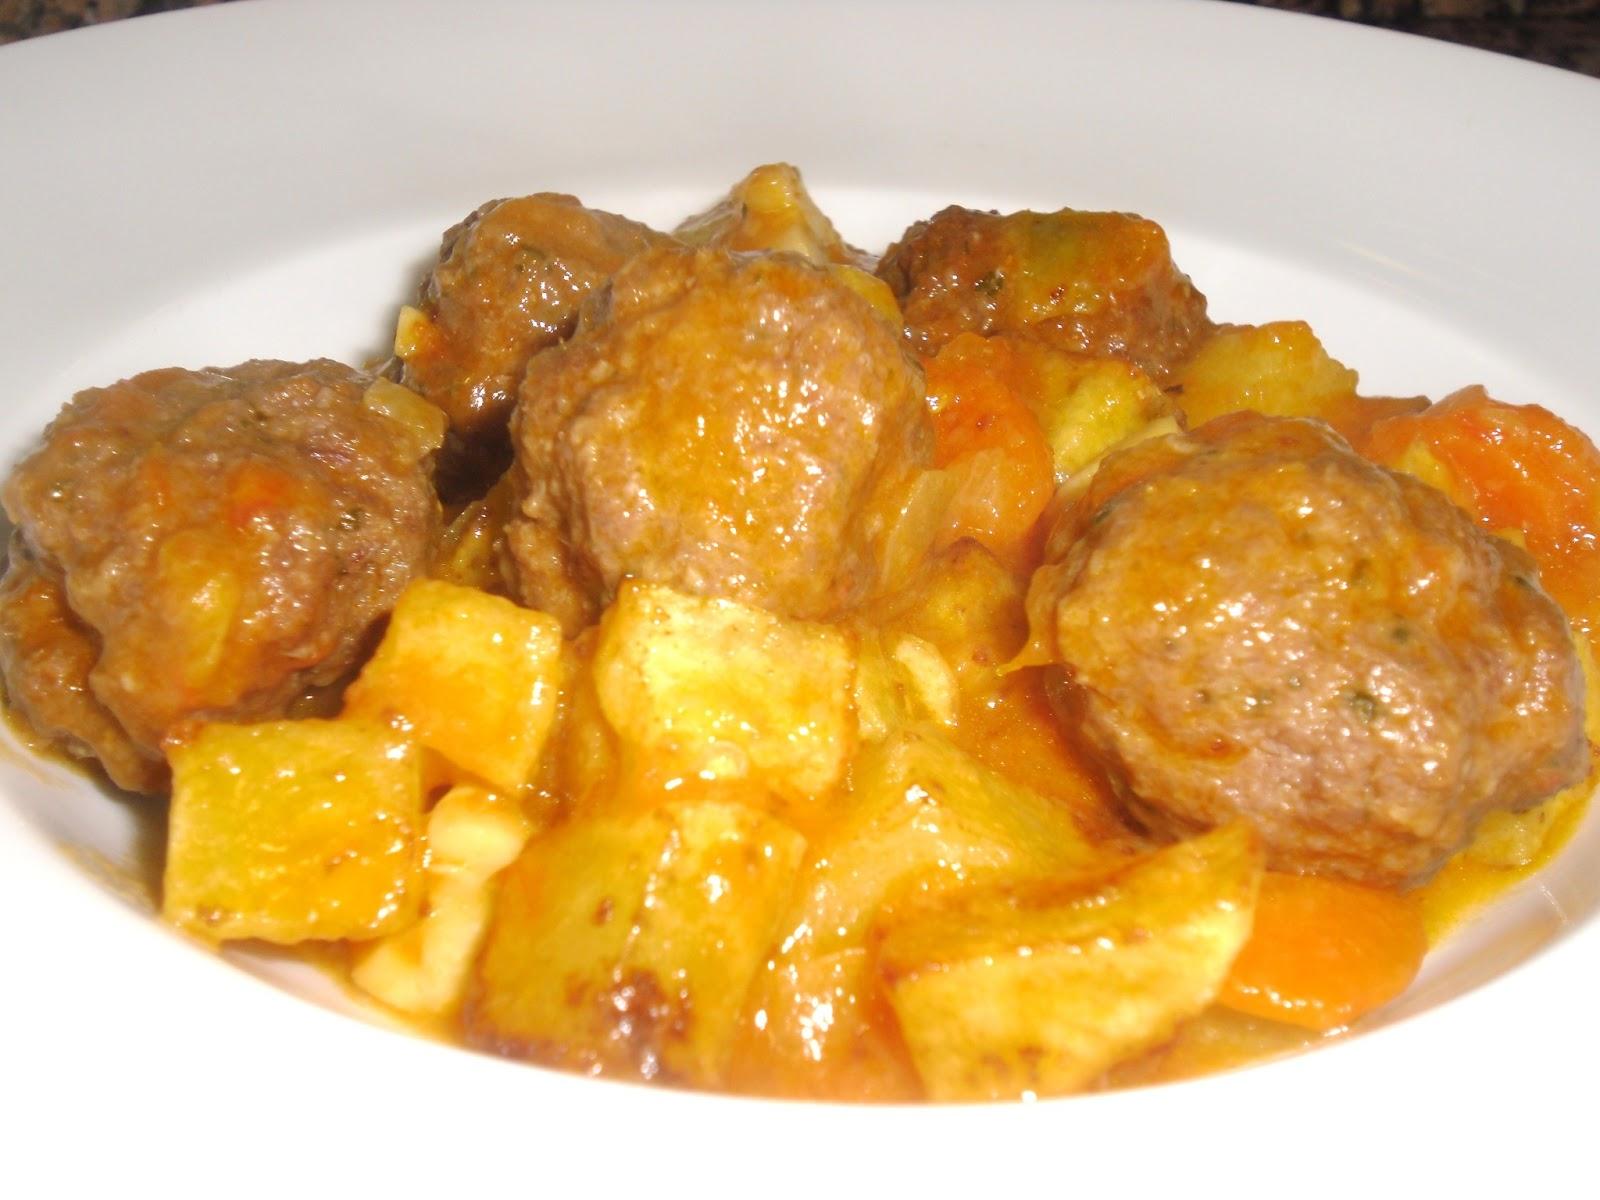 La cocina de temporada alb ndigas con salsa de verdura - Albondigas de verdura ...